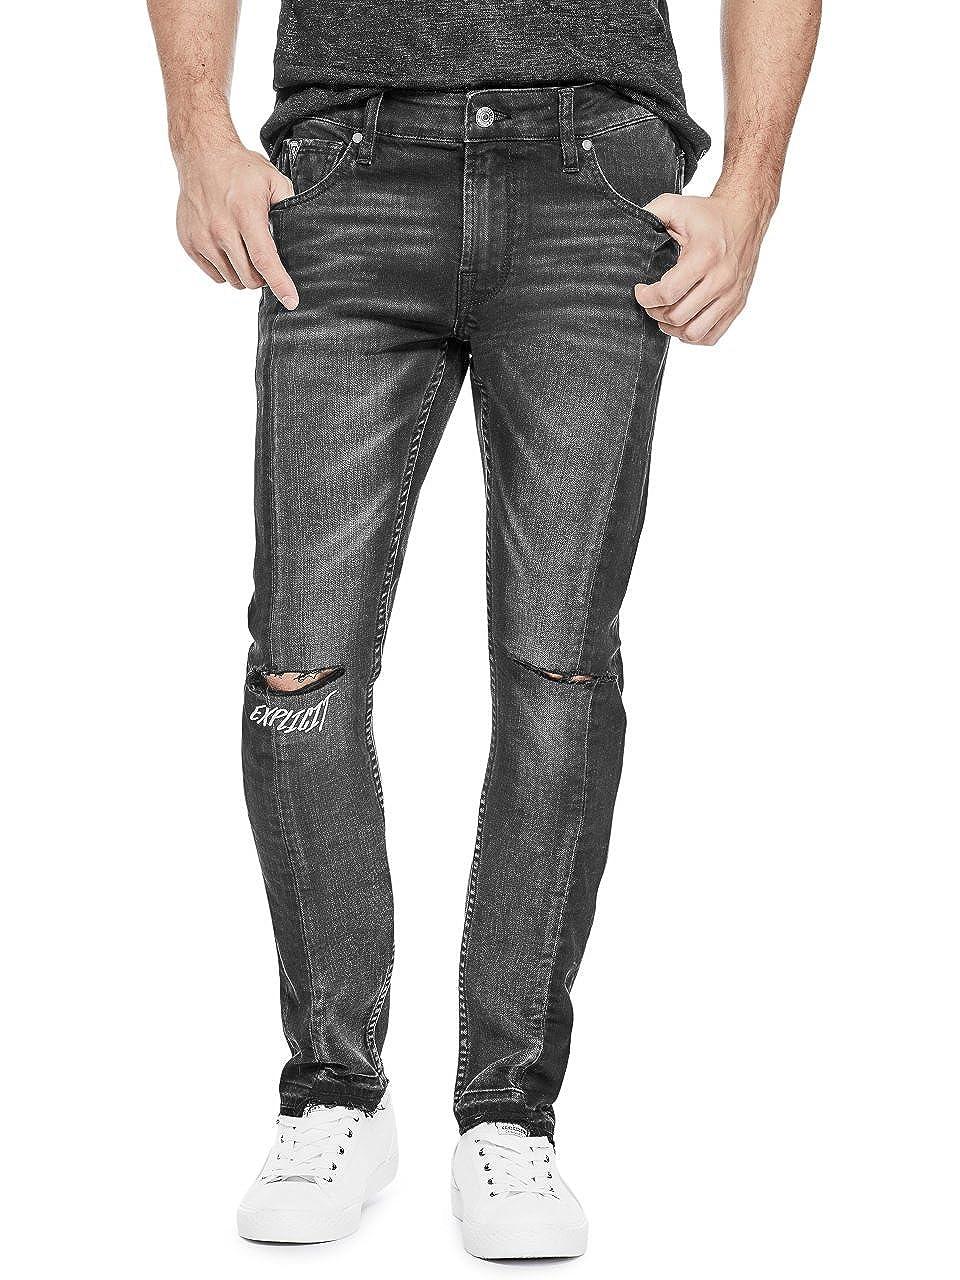 GUESS PANTS メンズ B079JR18JS  Vintage Black W/ Knee Sli 32 / R